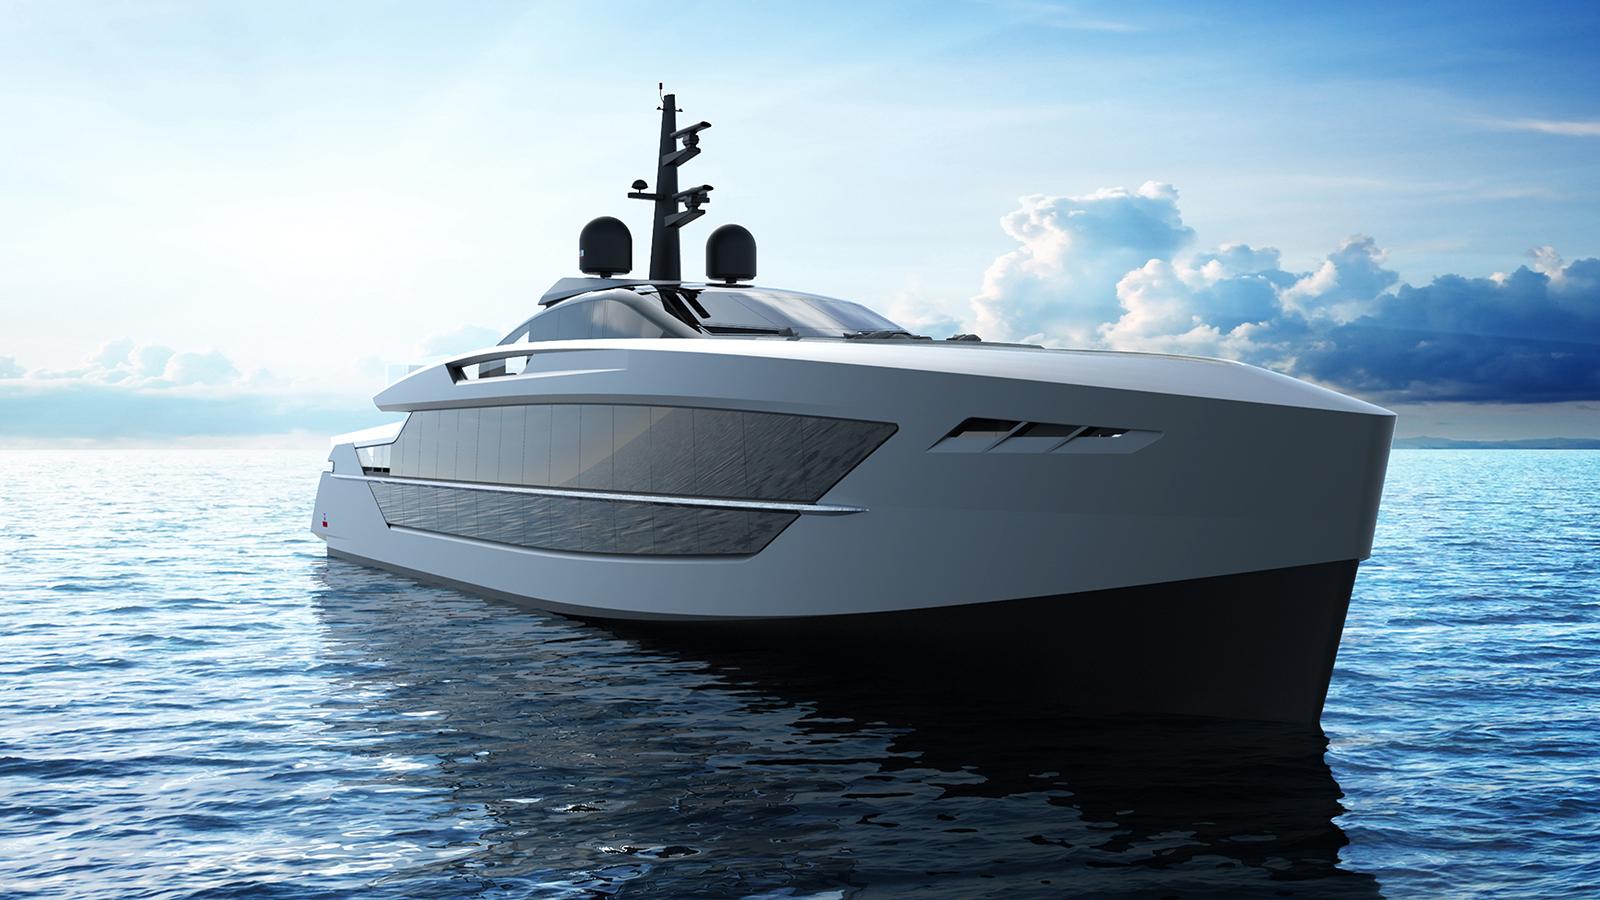 bow-view-of-the-53-metre-tankoa-motor-yacht-saetta